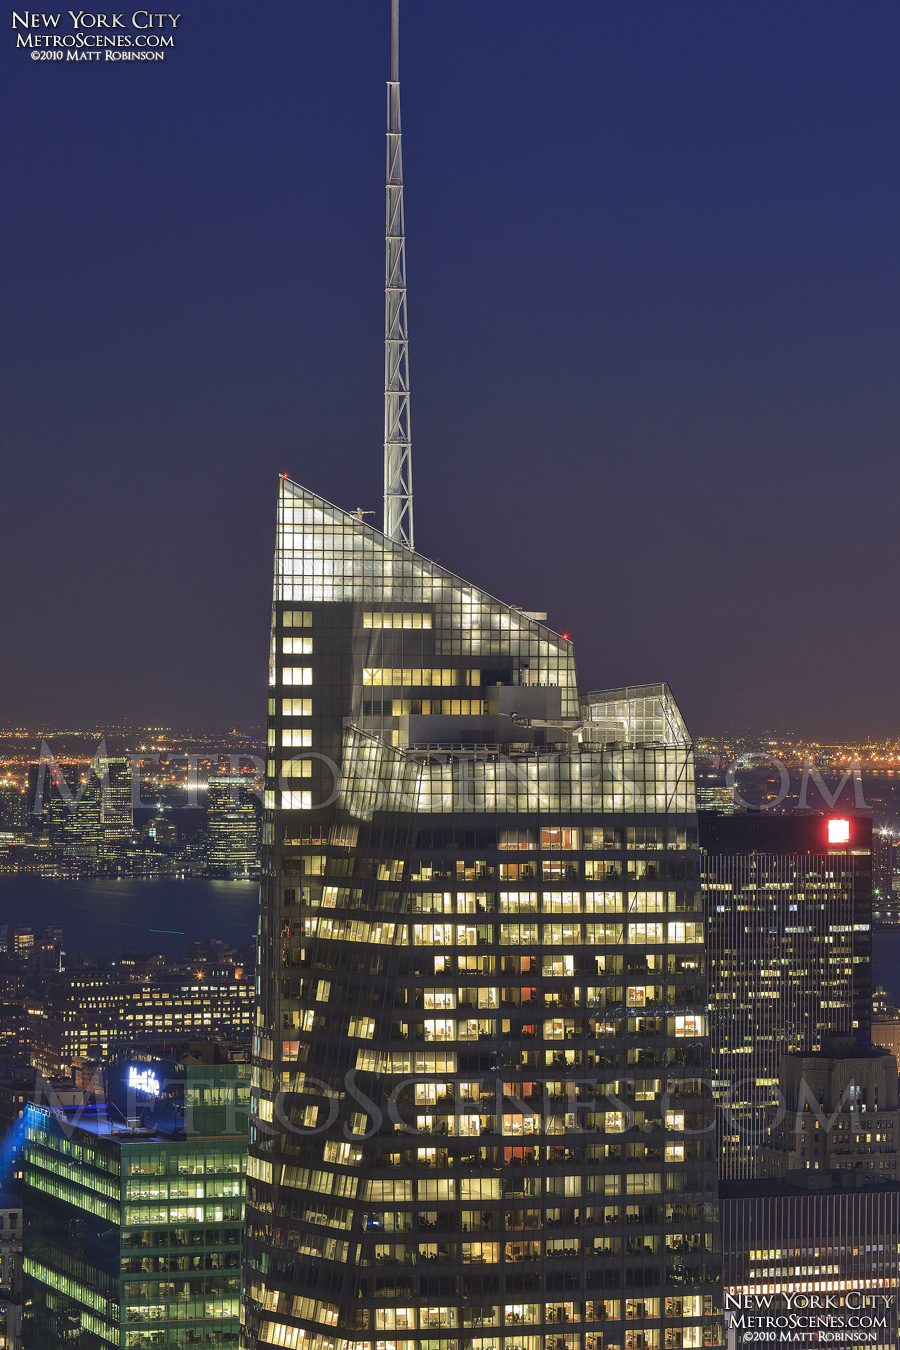 Bank of America Tower, New York